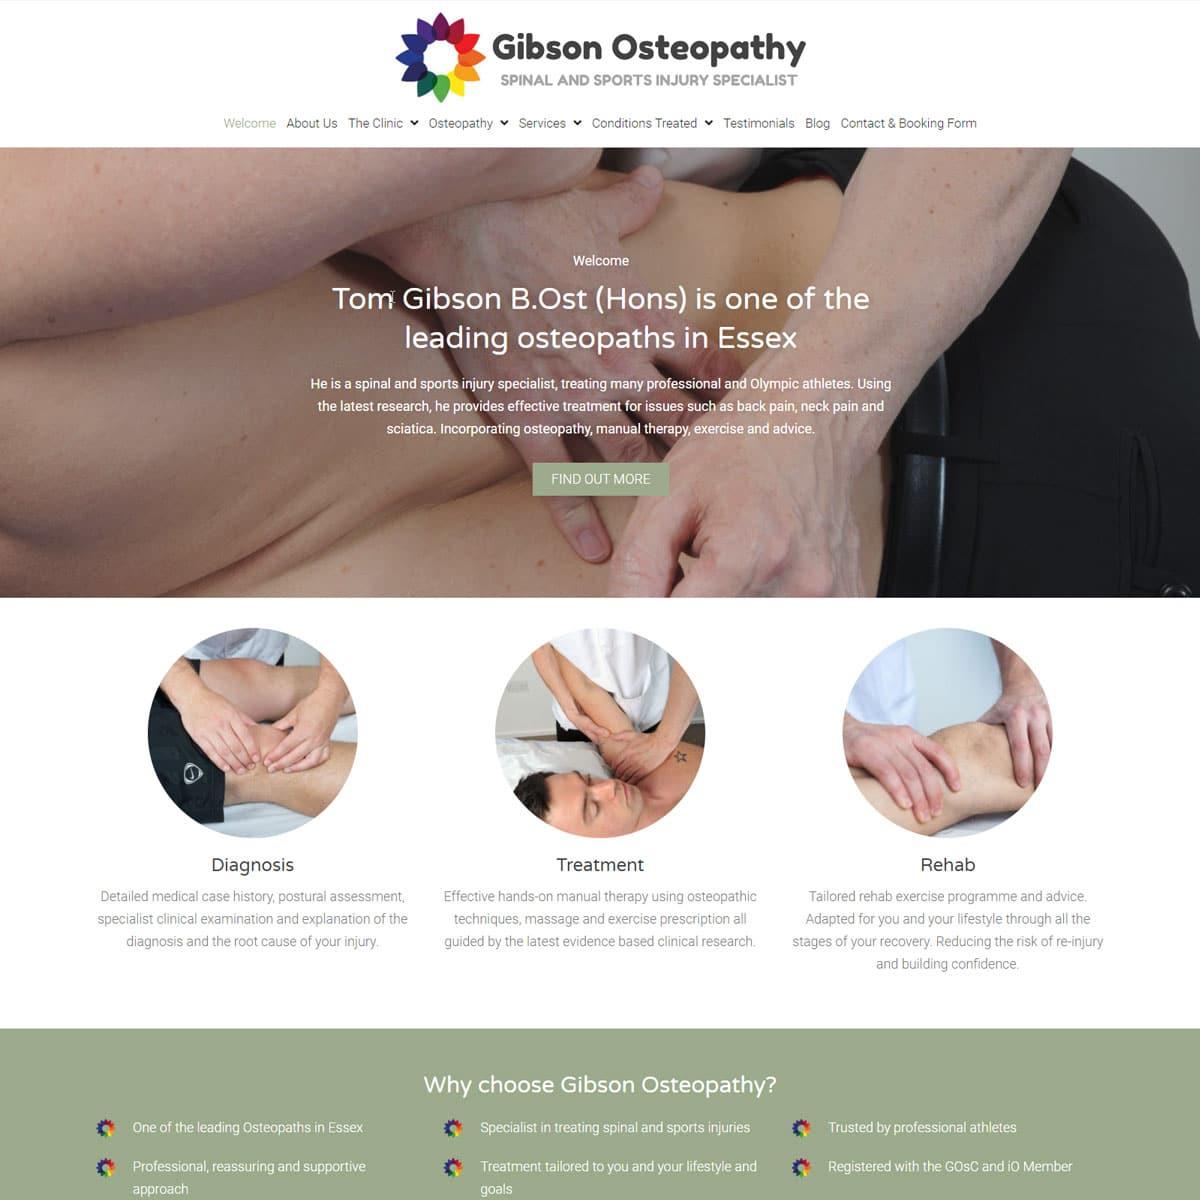 gibsonosteopathy